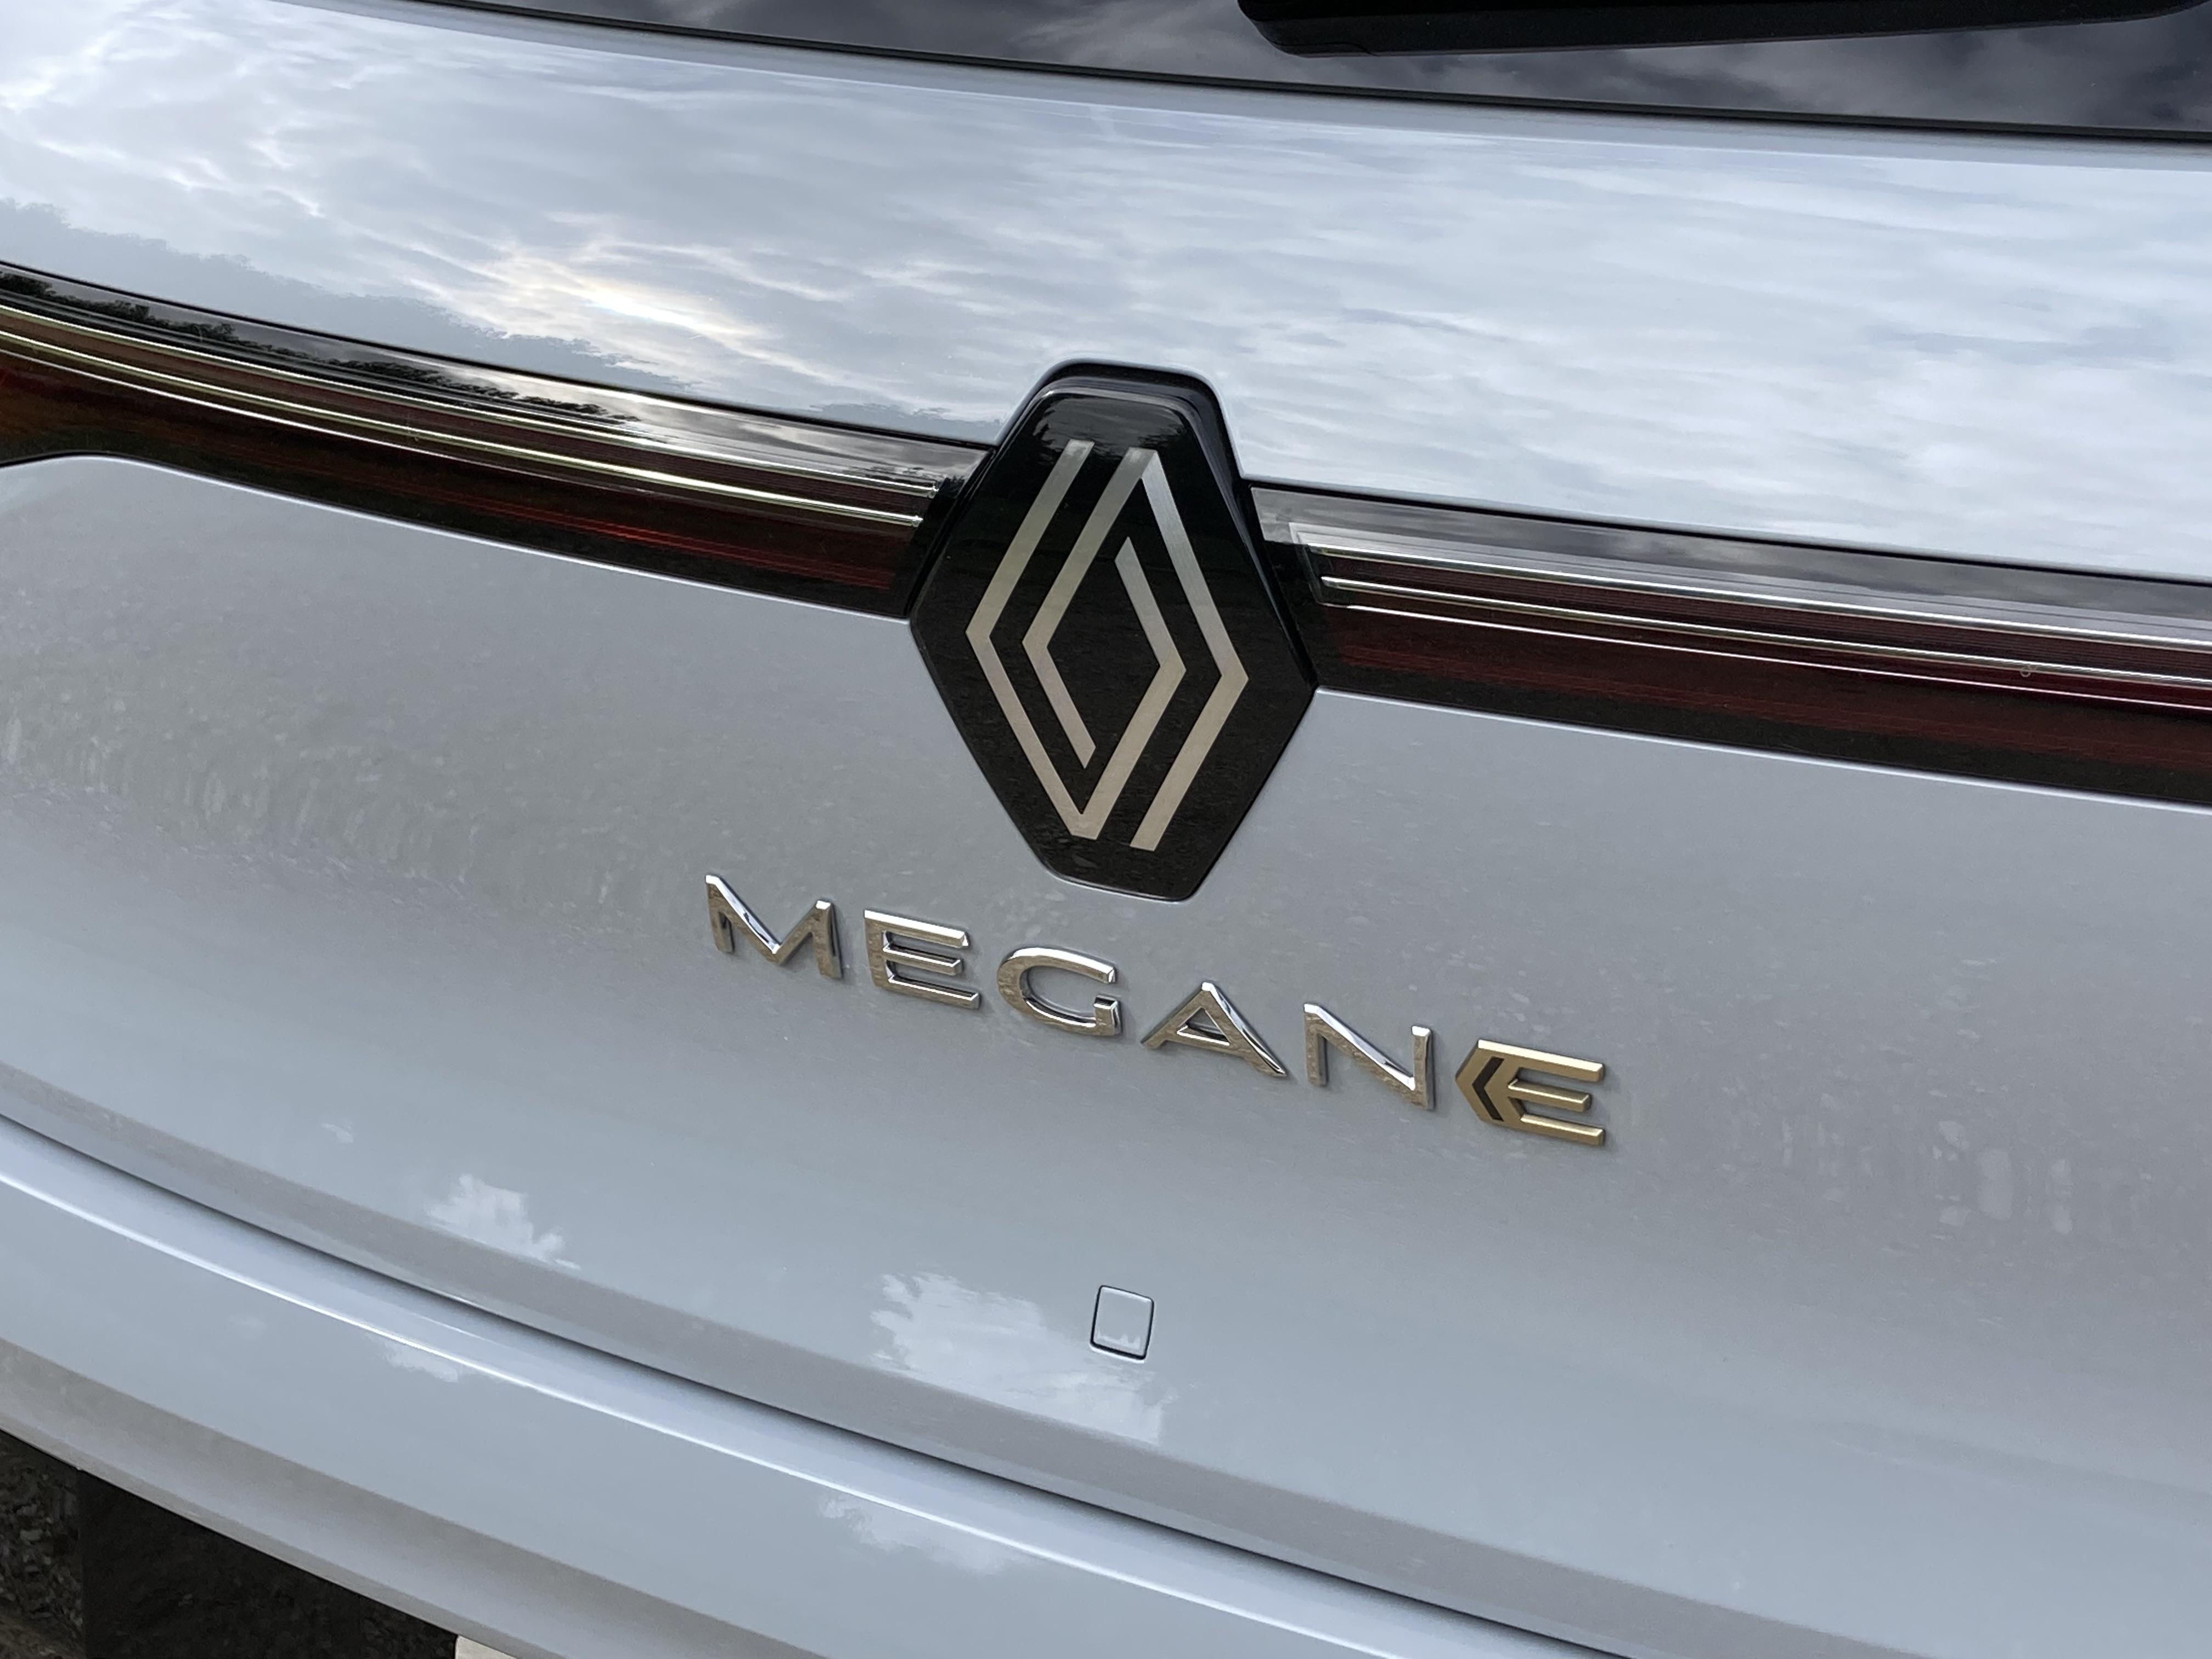 2021 - [Renault] Mégane E-Tech Electric [BCB] - Page 15 S0-comparatif-video-renault-megane-e-tech-electrique-vs-volkswagen-id-3-692858